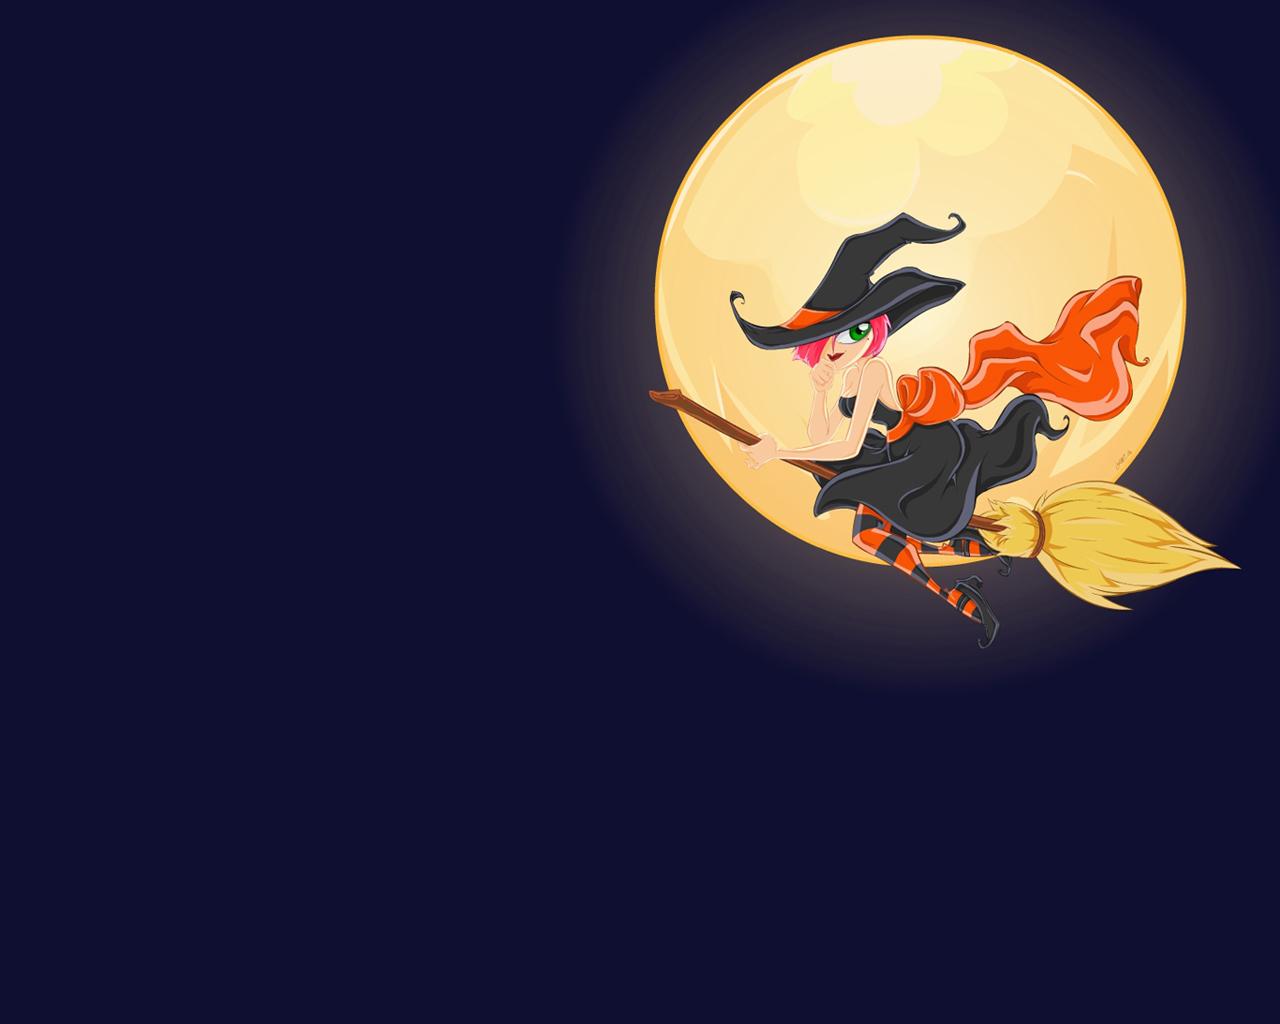 Scary Halloween 2012 Beautiful Witch HD Wallpaper 1280x1024